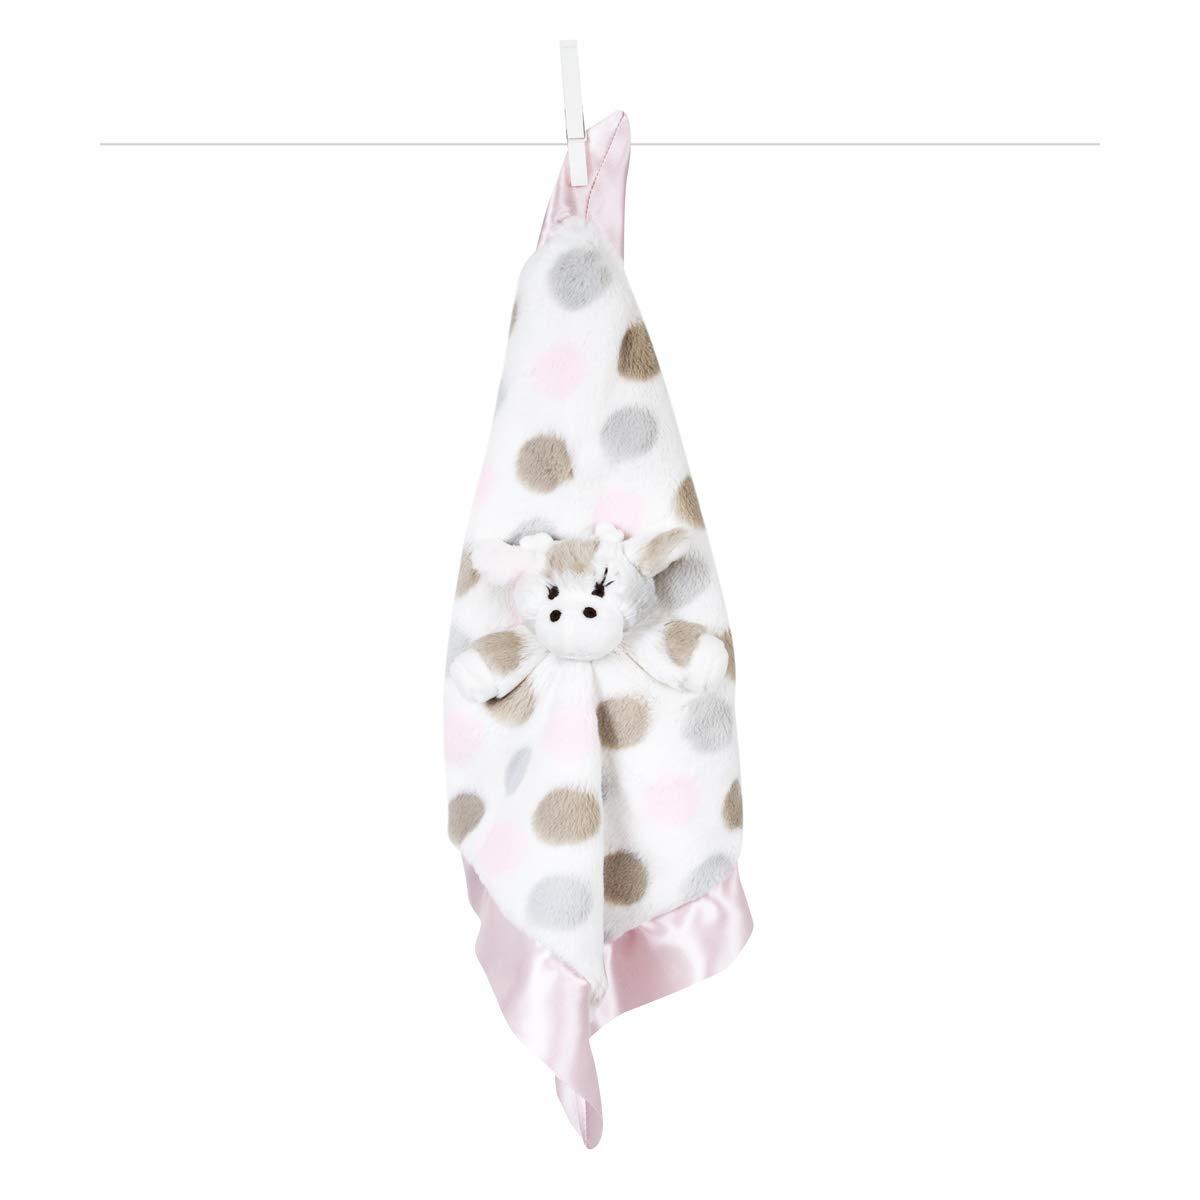 Little Giraffe Little G Blanky - Animal Security Blanket (Pink)